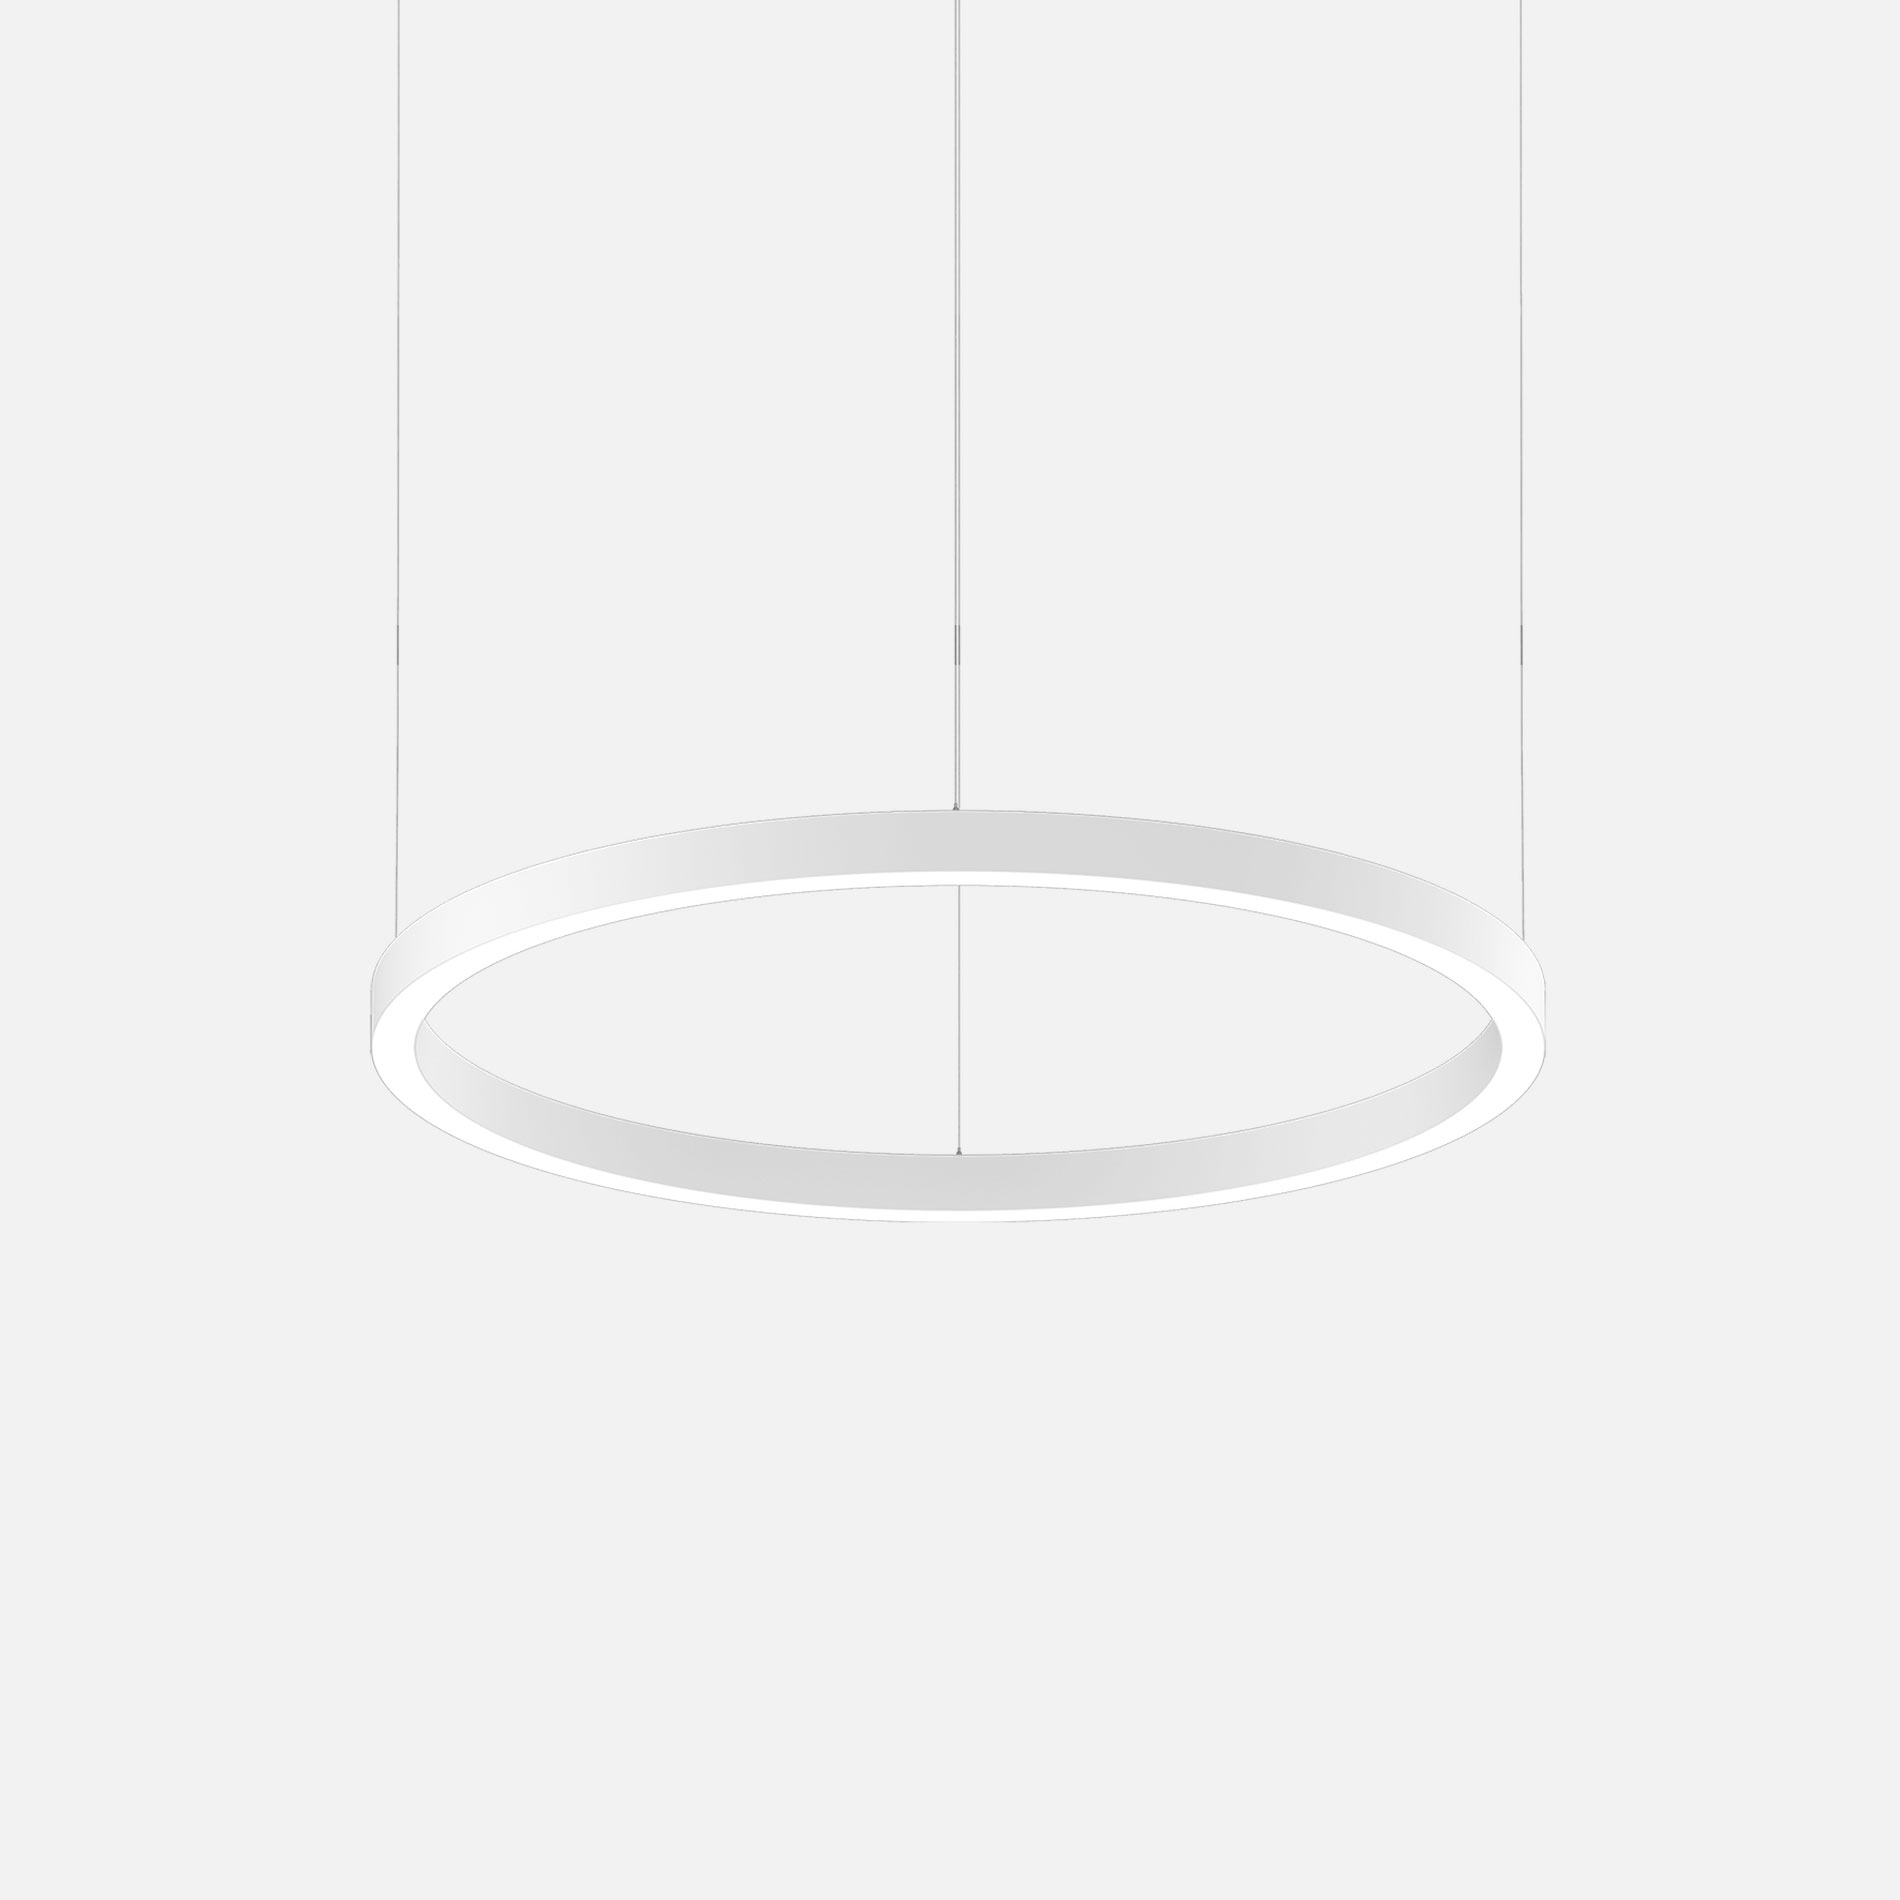 Mino 60 circle 1000 suspended white 1